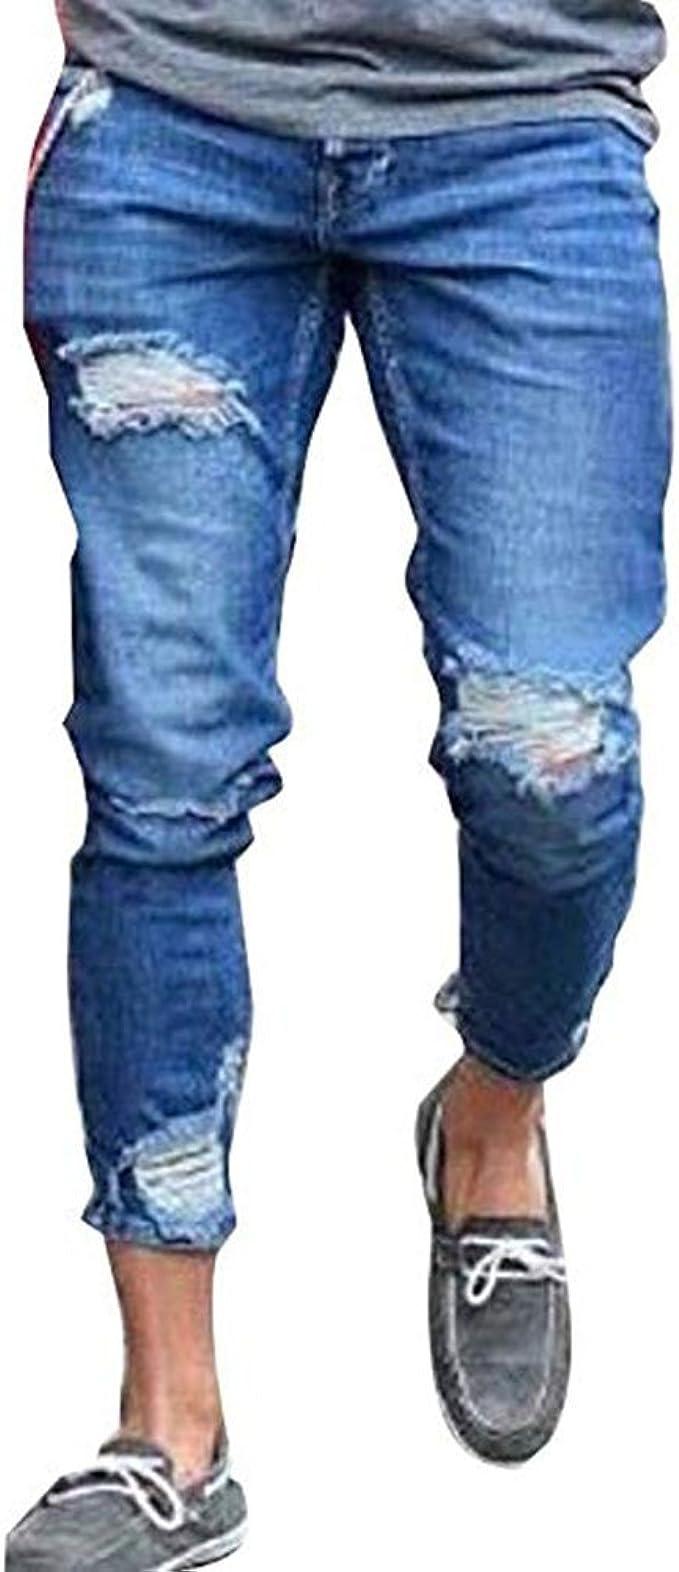 Hombre Huateng Pantalones Vaqueros Rasgados Para Hombre Pantalones Vaqueros Pitillo Para Hombres Ropa Aceautocare Net